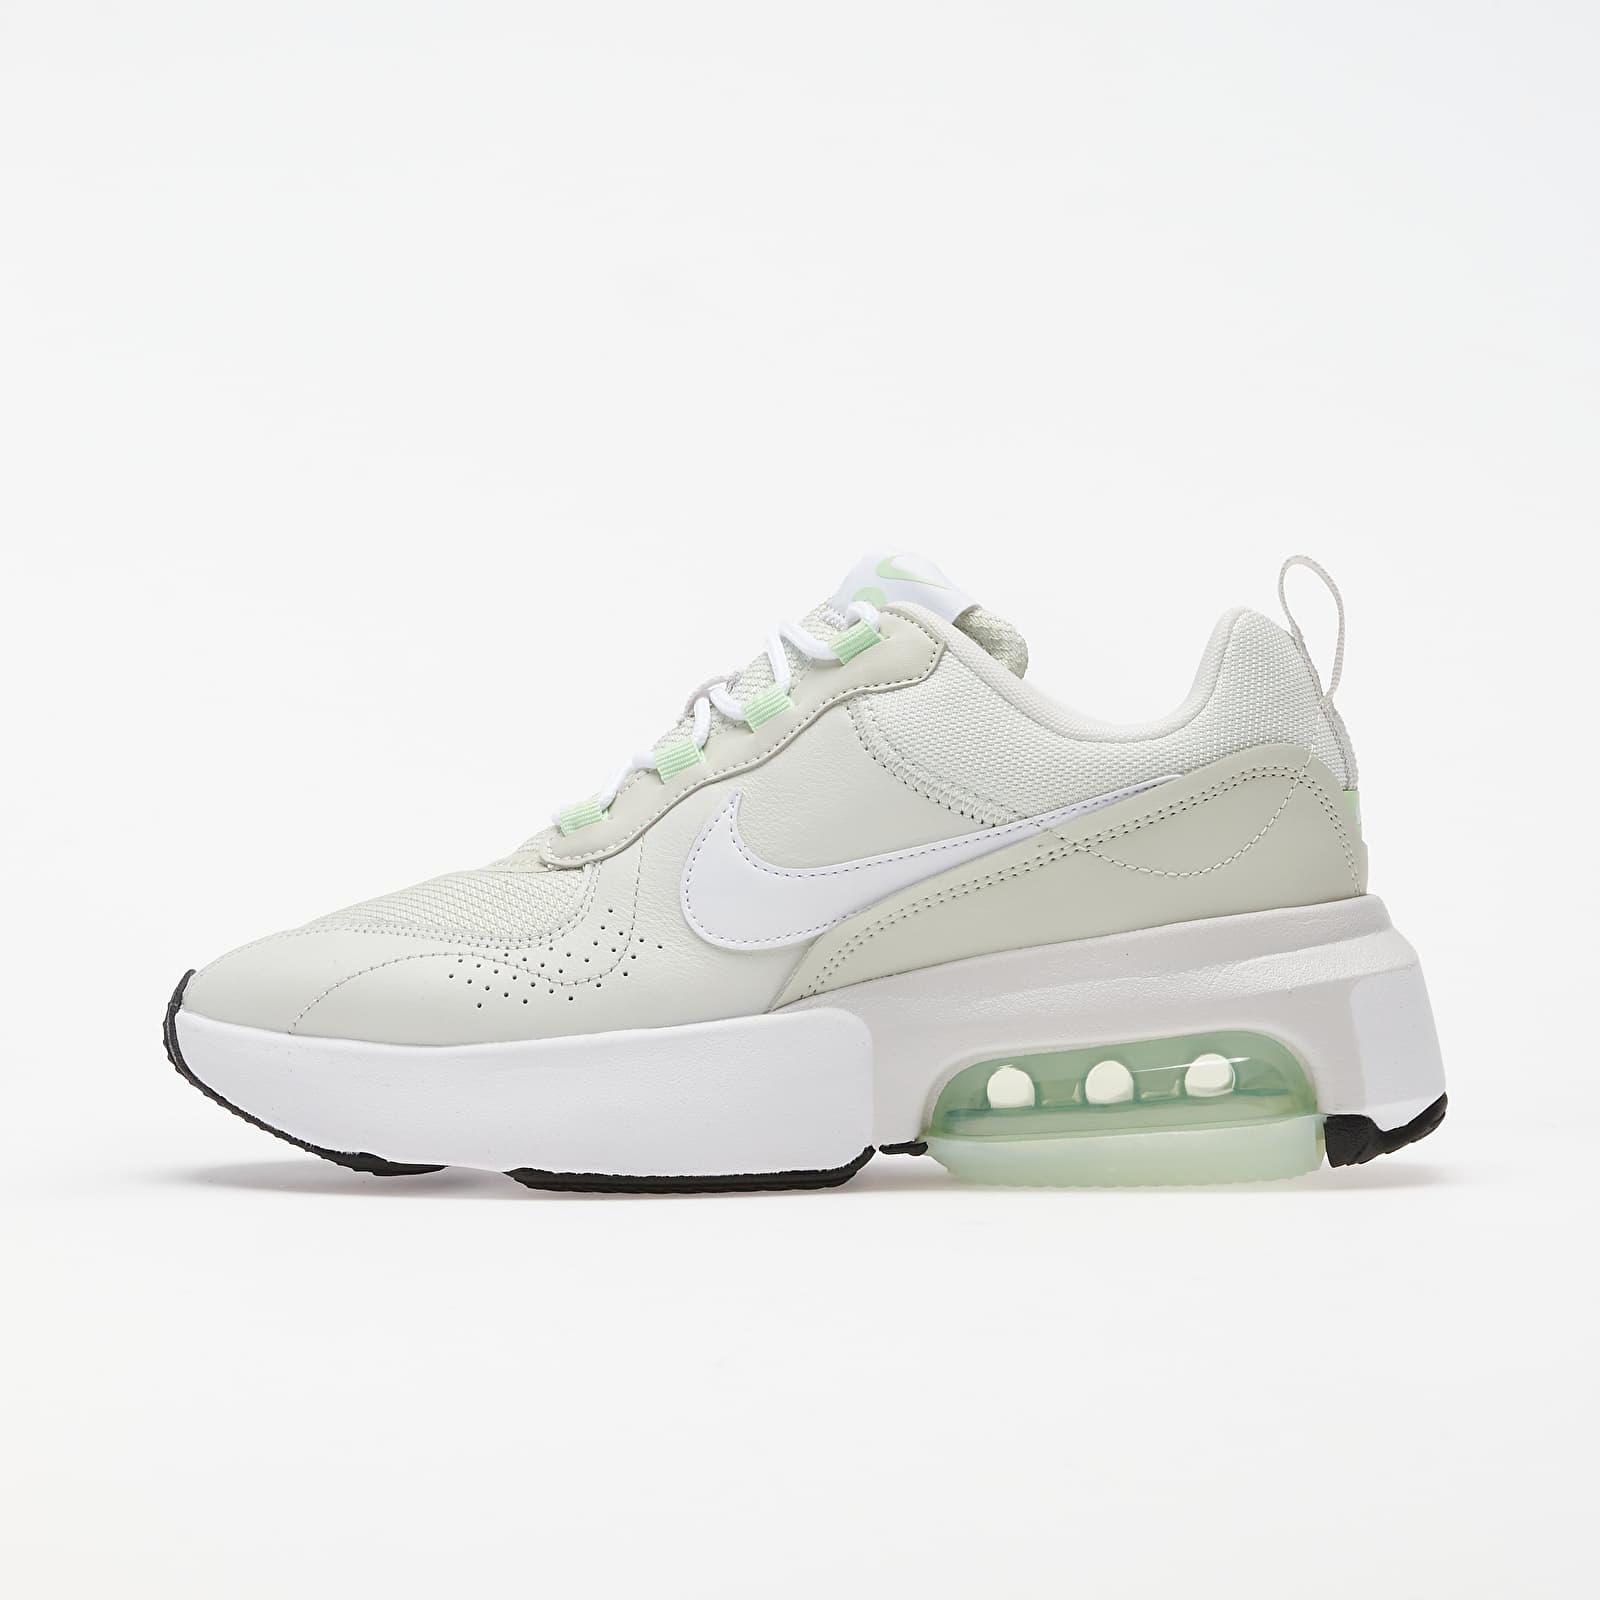 Zapatillas mujer Nike W Air Max Verona Spruce Aura/ White-Platinum Tint